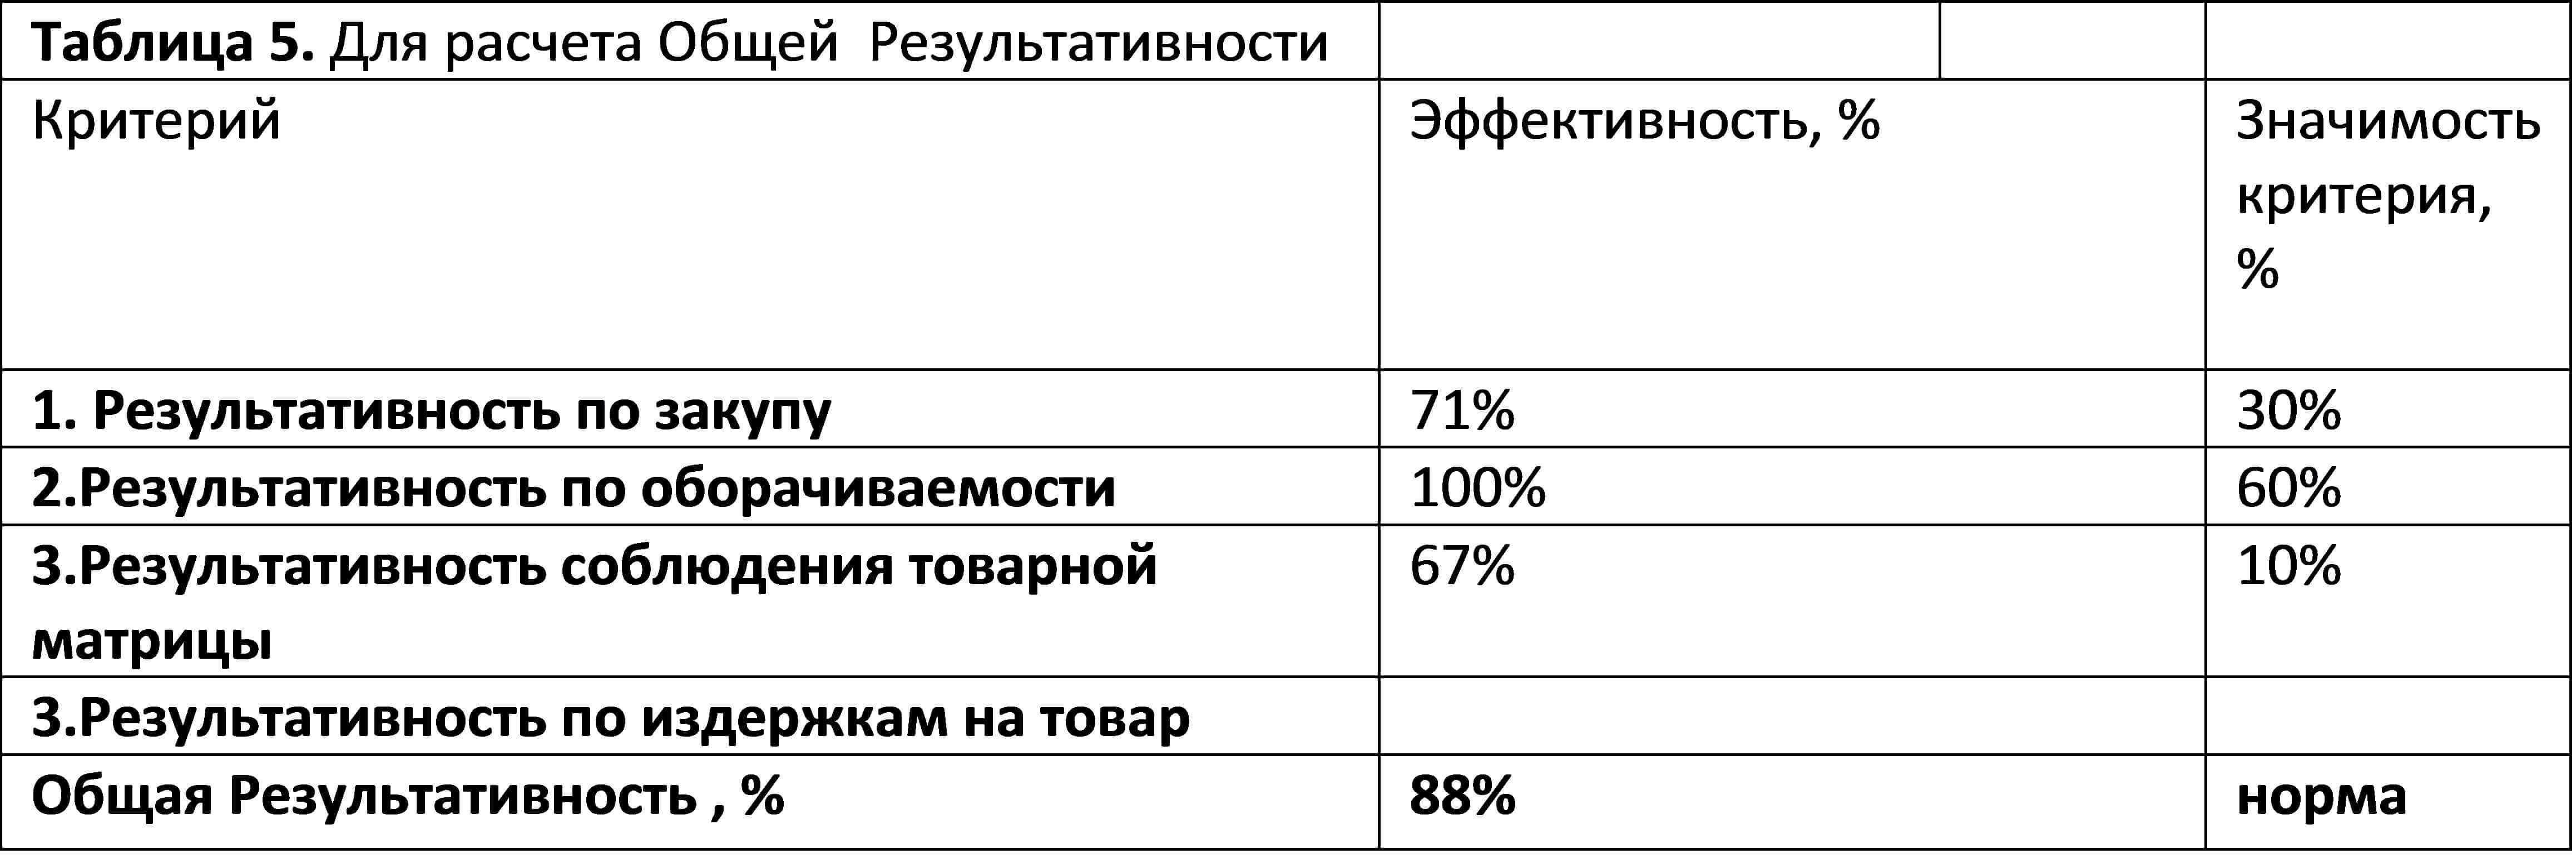 Таблица расчета общей результативности